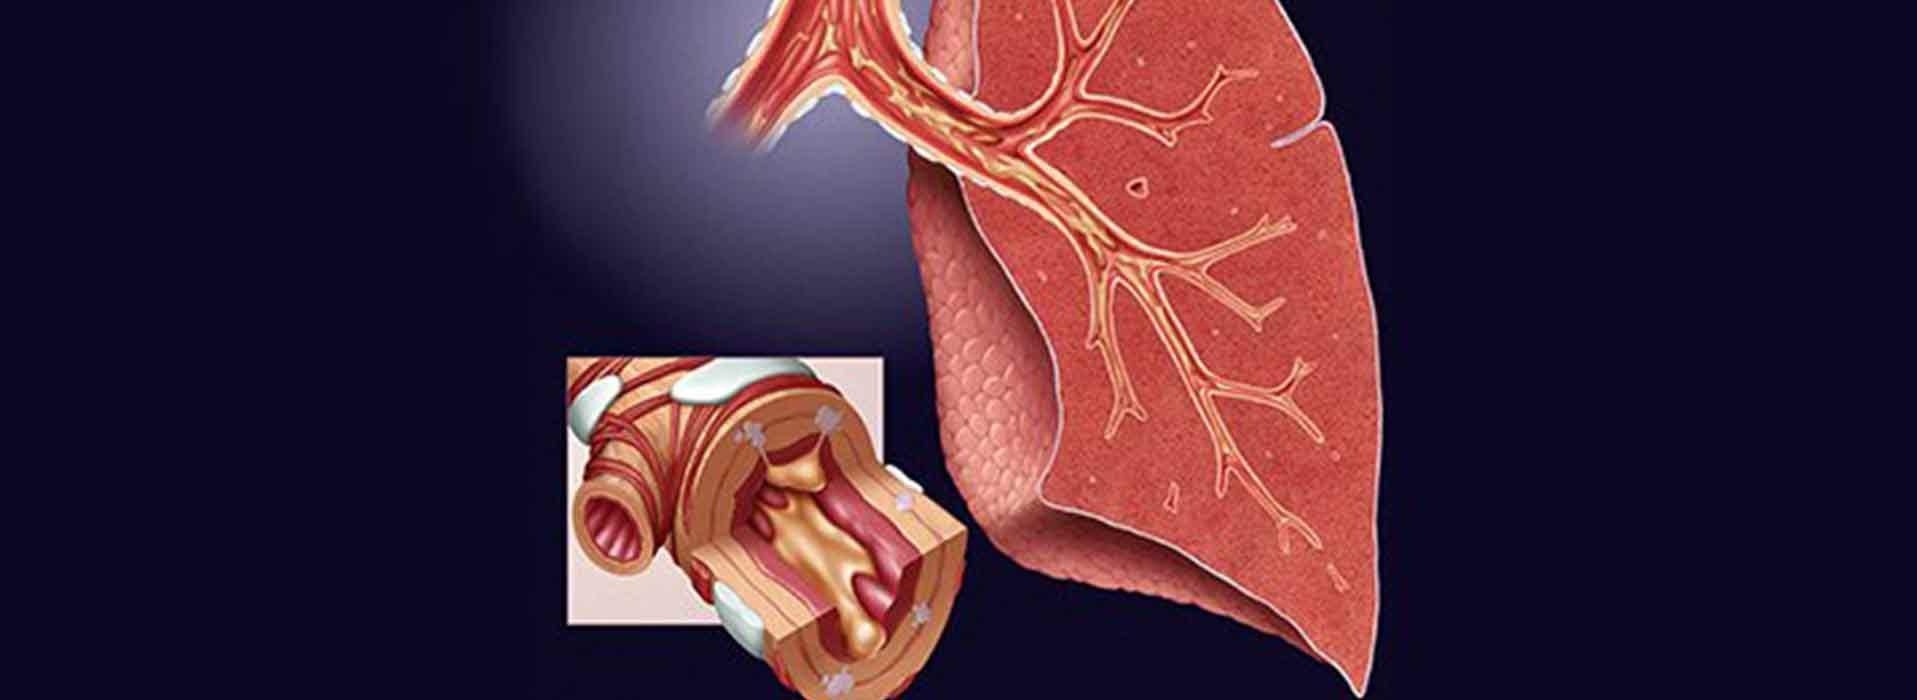 Bronchitis COPD